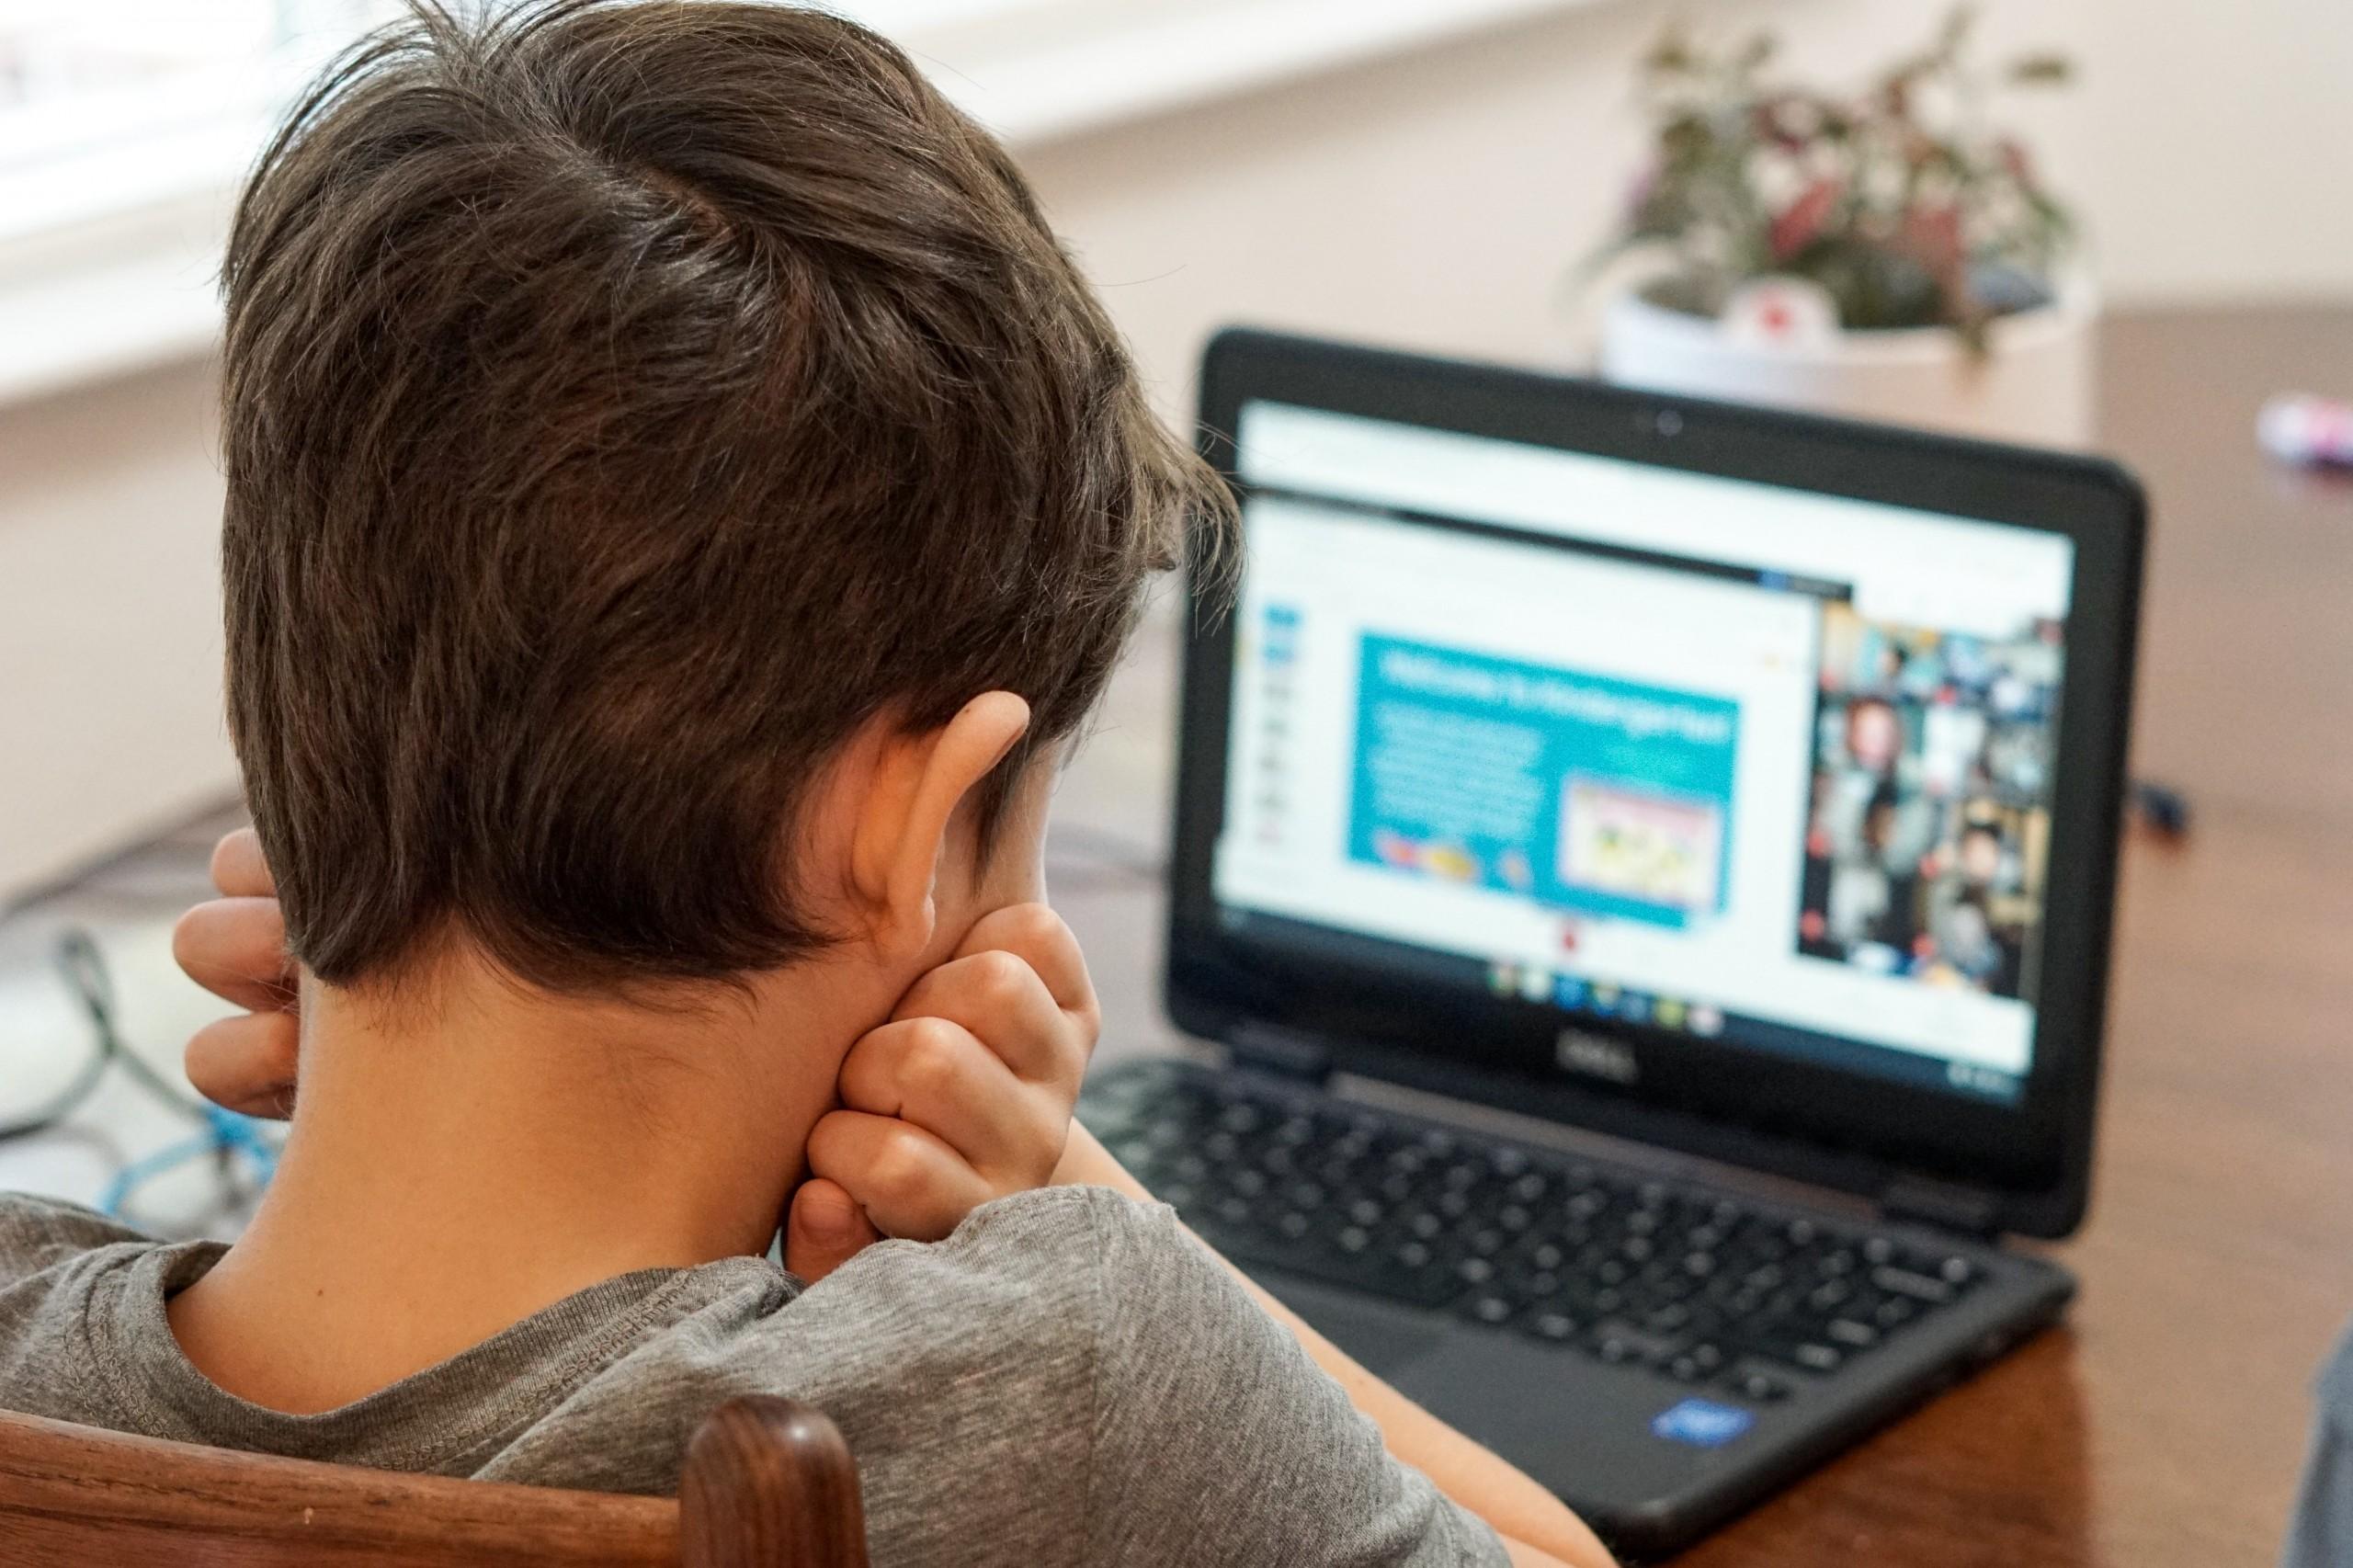 profesorii nevaccinați ar putea preda doar online